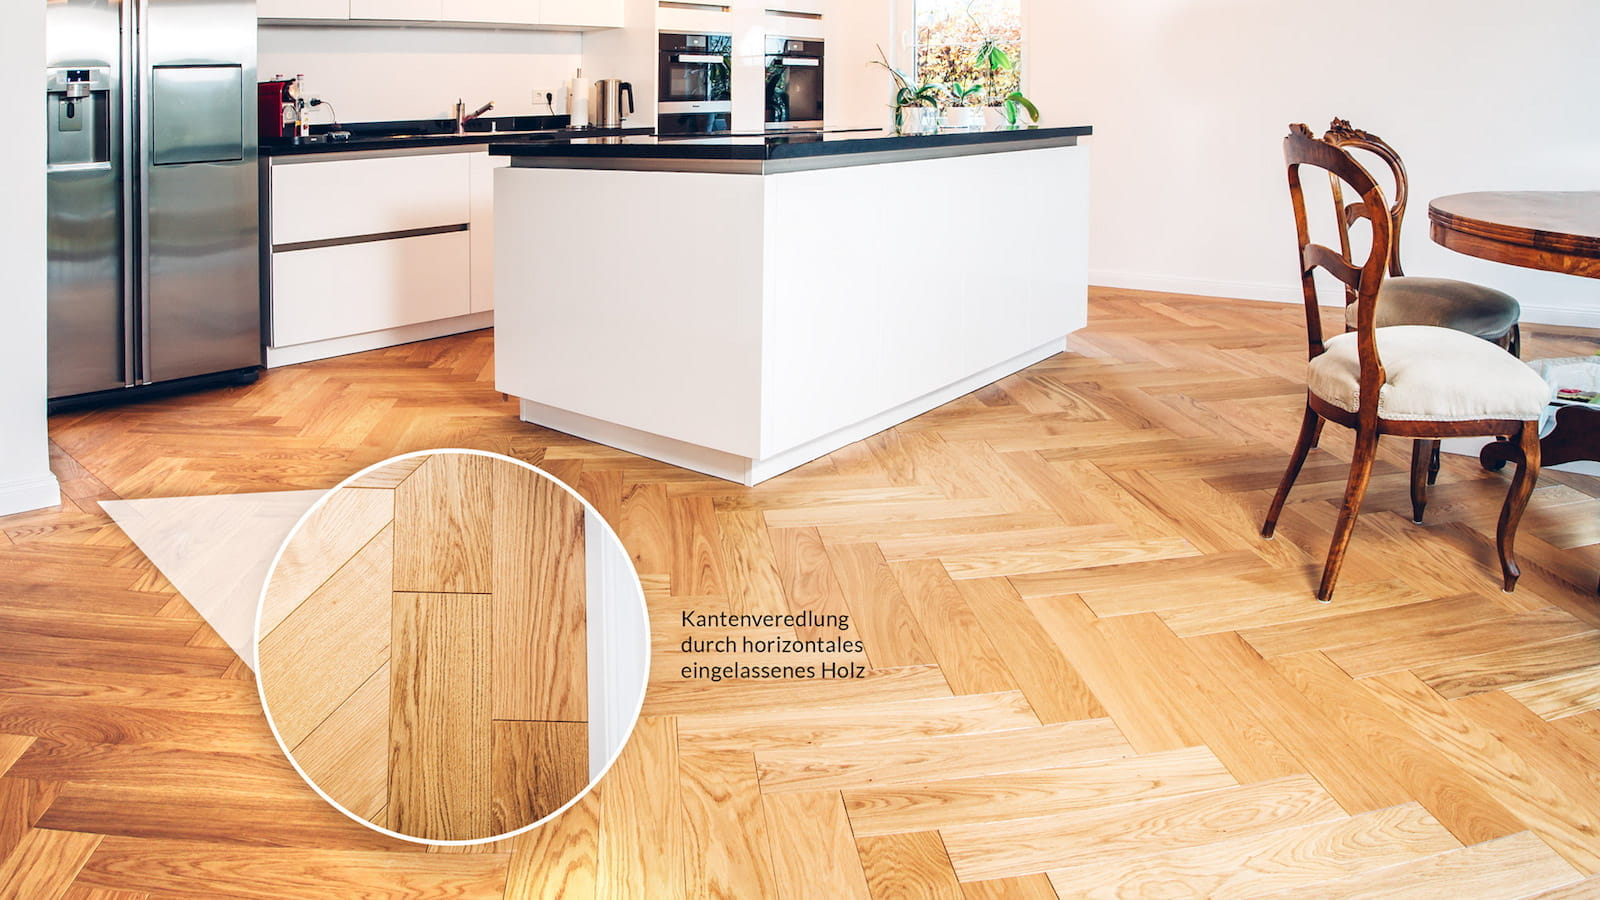 Fußboden Verlegen Berlin ~ Parkett berlin holzfußböden verlegen und aufbereiten